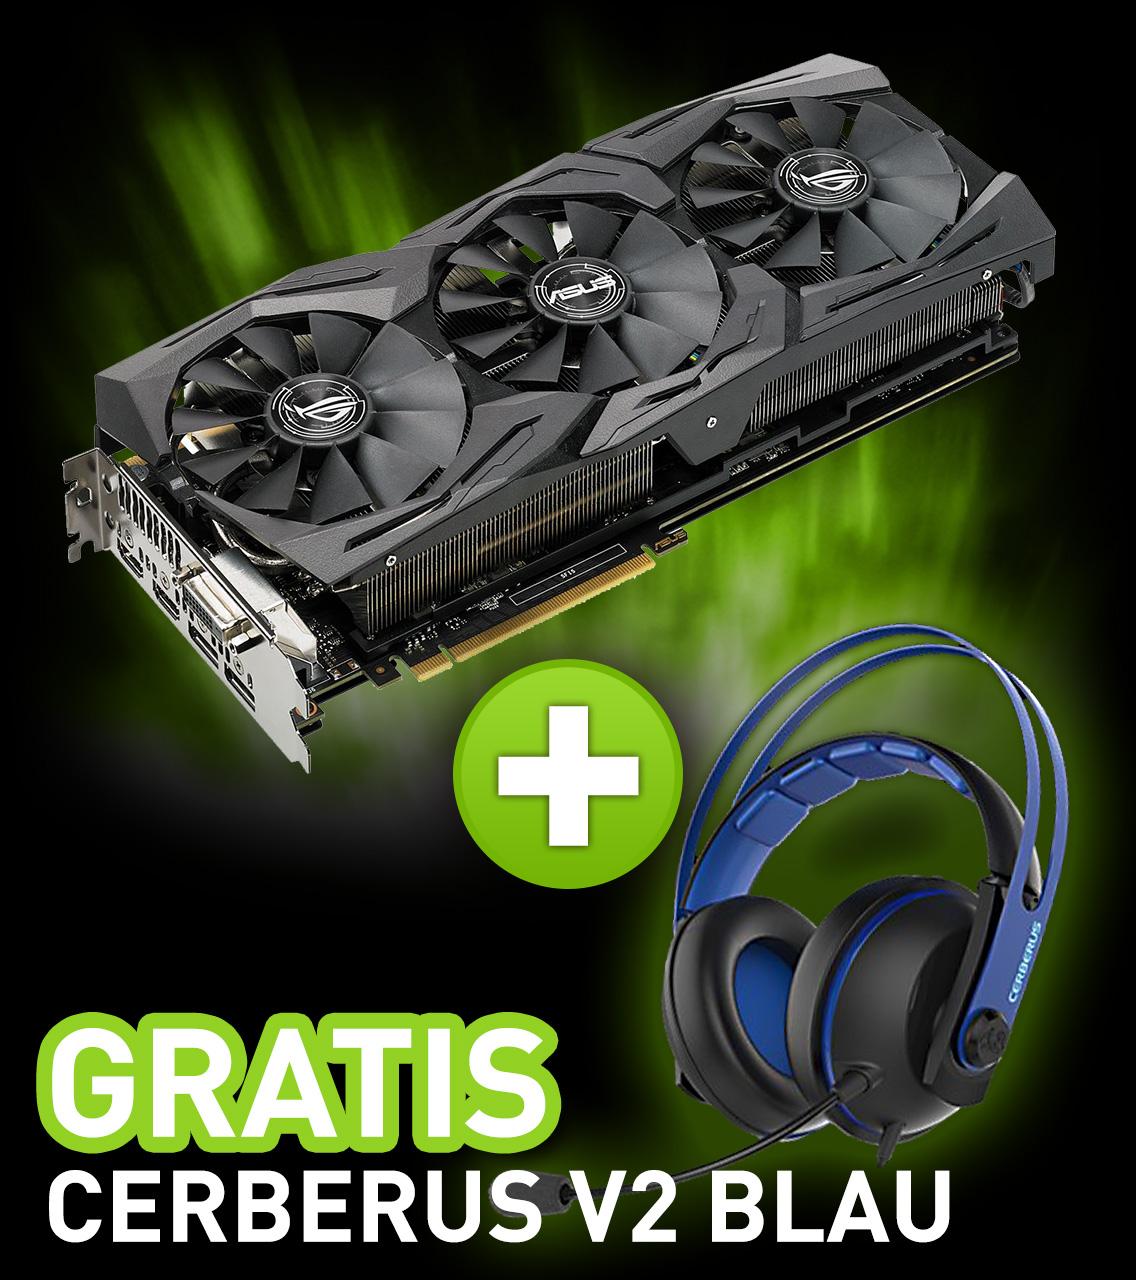 8GB Asus GeForce GTX 1080 ROG Strix OC Aktiv PCIe 3.0 x16 (Retail)